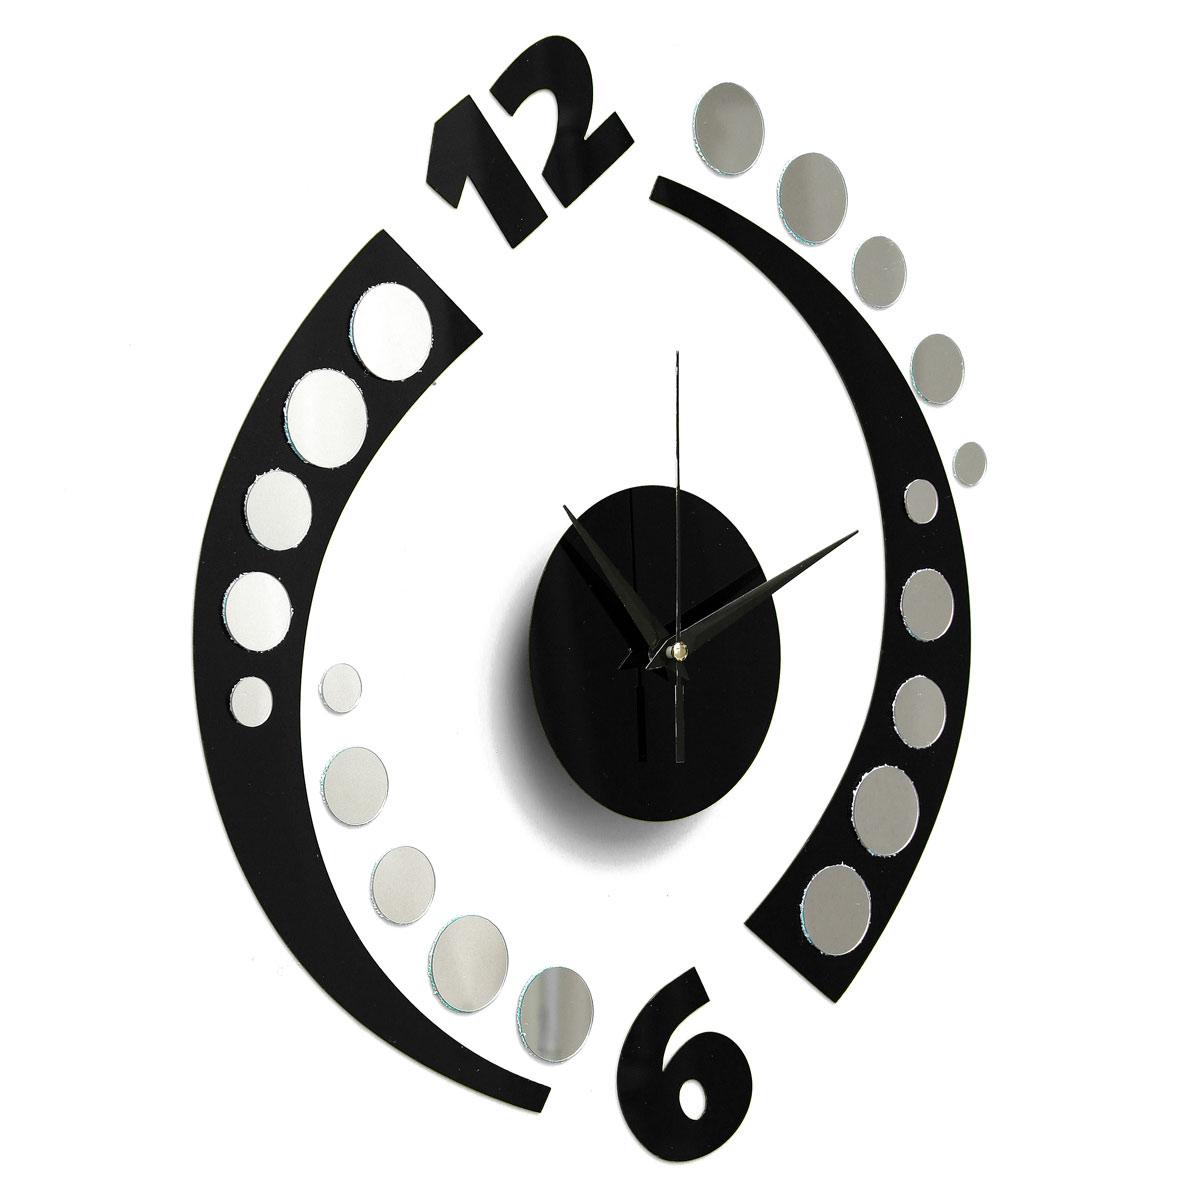 3d diy orologio adesivo da parete rotation clock wall for Orologio stickers